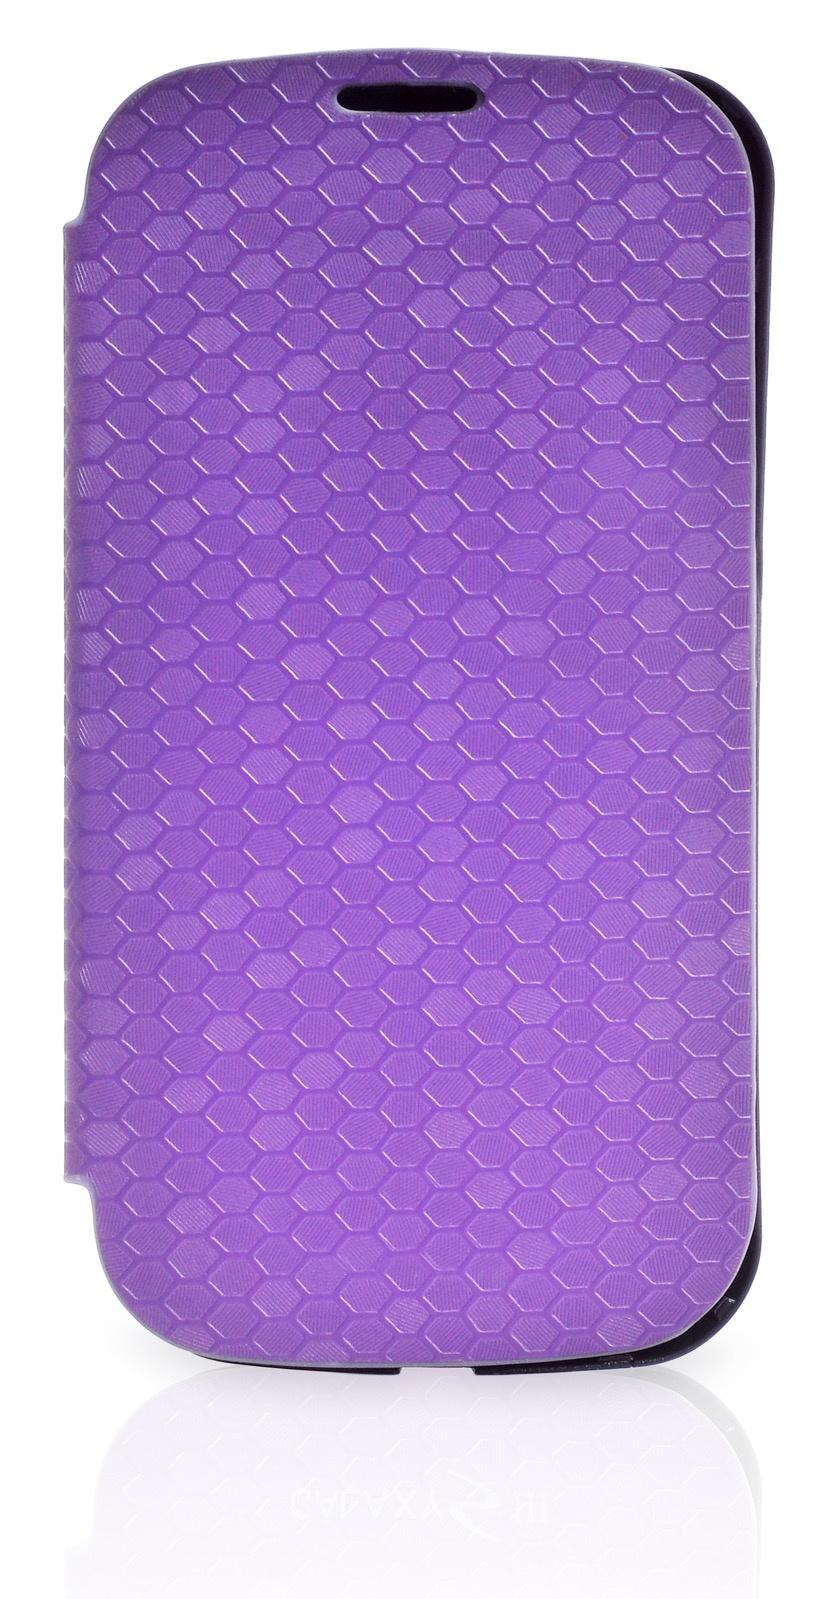 Чехол Gurdini Flip Case соты 380036 для Samsung Galaxy S3,380036, фиолетовый